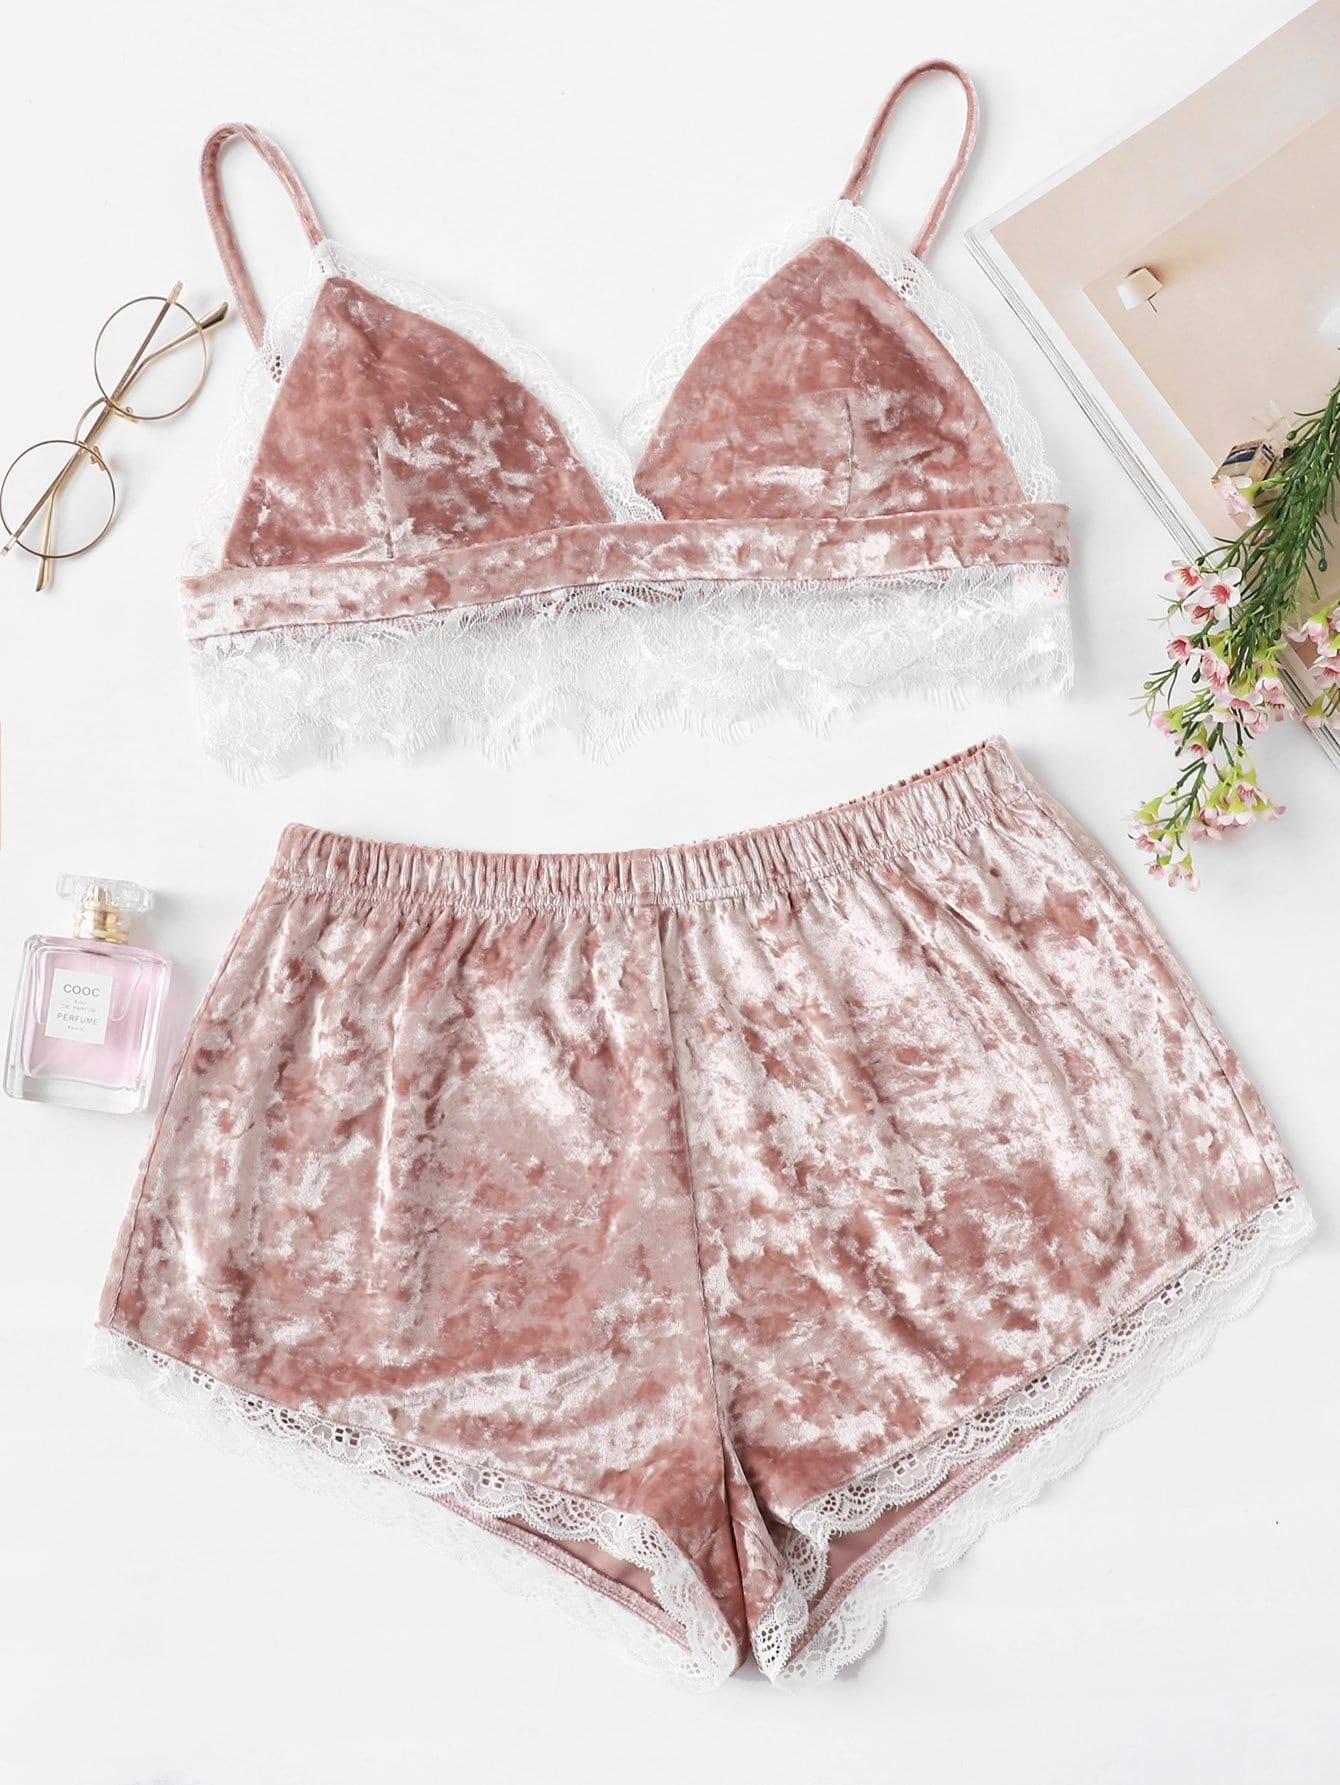 Eyelash Lace Trim Velvet Cami Top and Shorts PJ Set crushed velvet top and shorts set